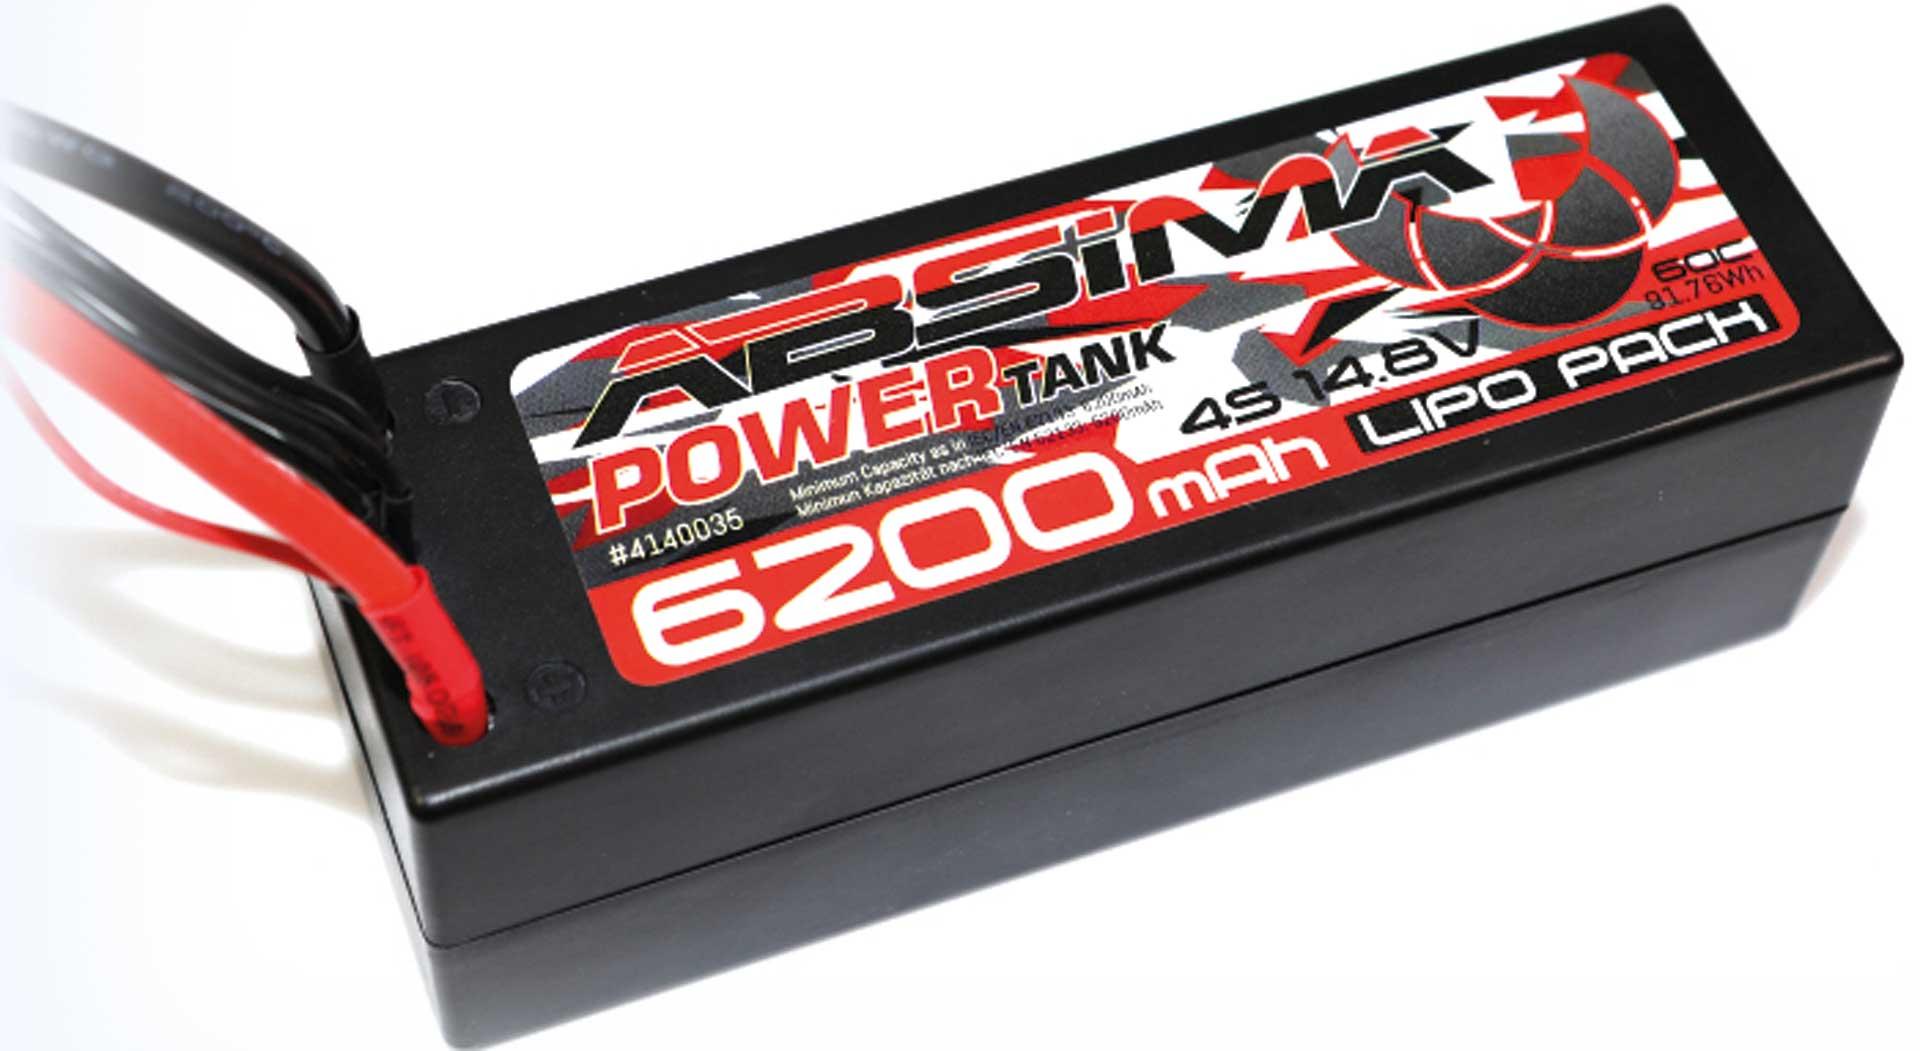 Absima Power Tank LiPo Stick Pack 14.8V-60C6200 Hardcase (T-Plug)